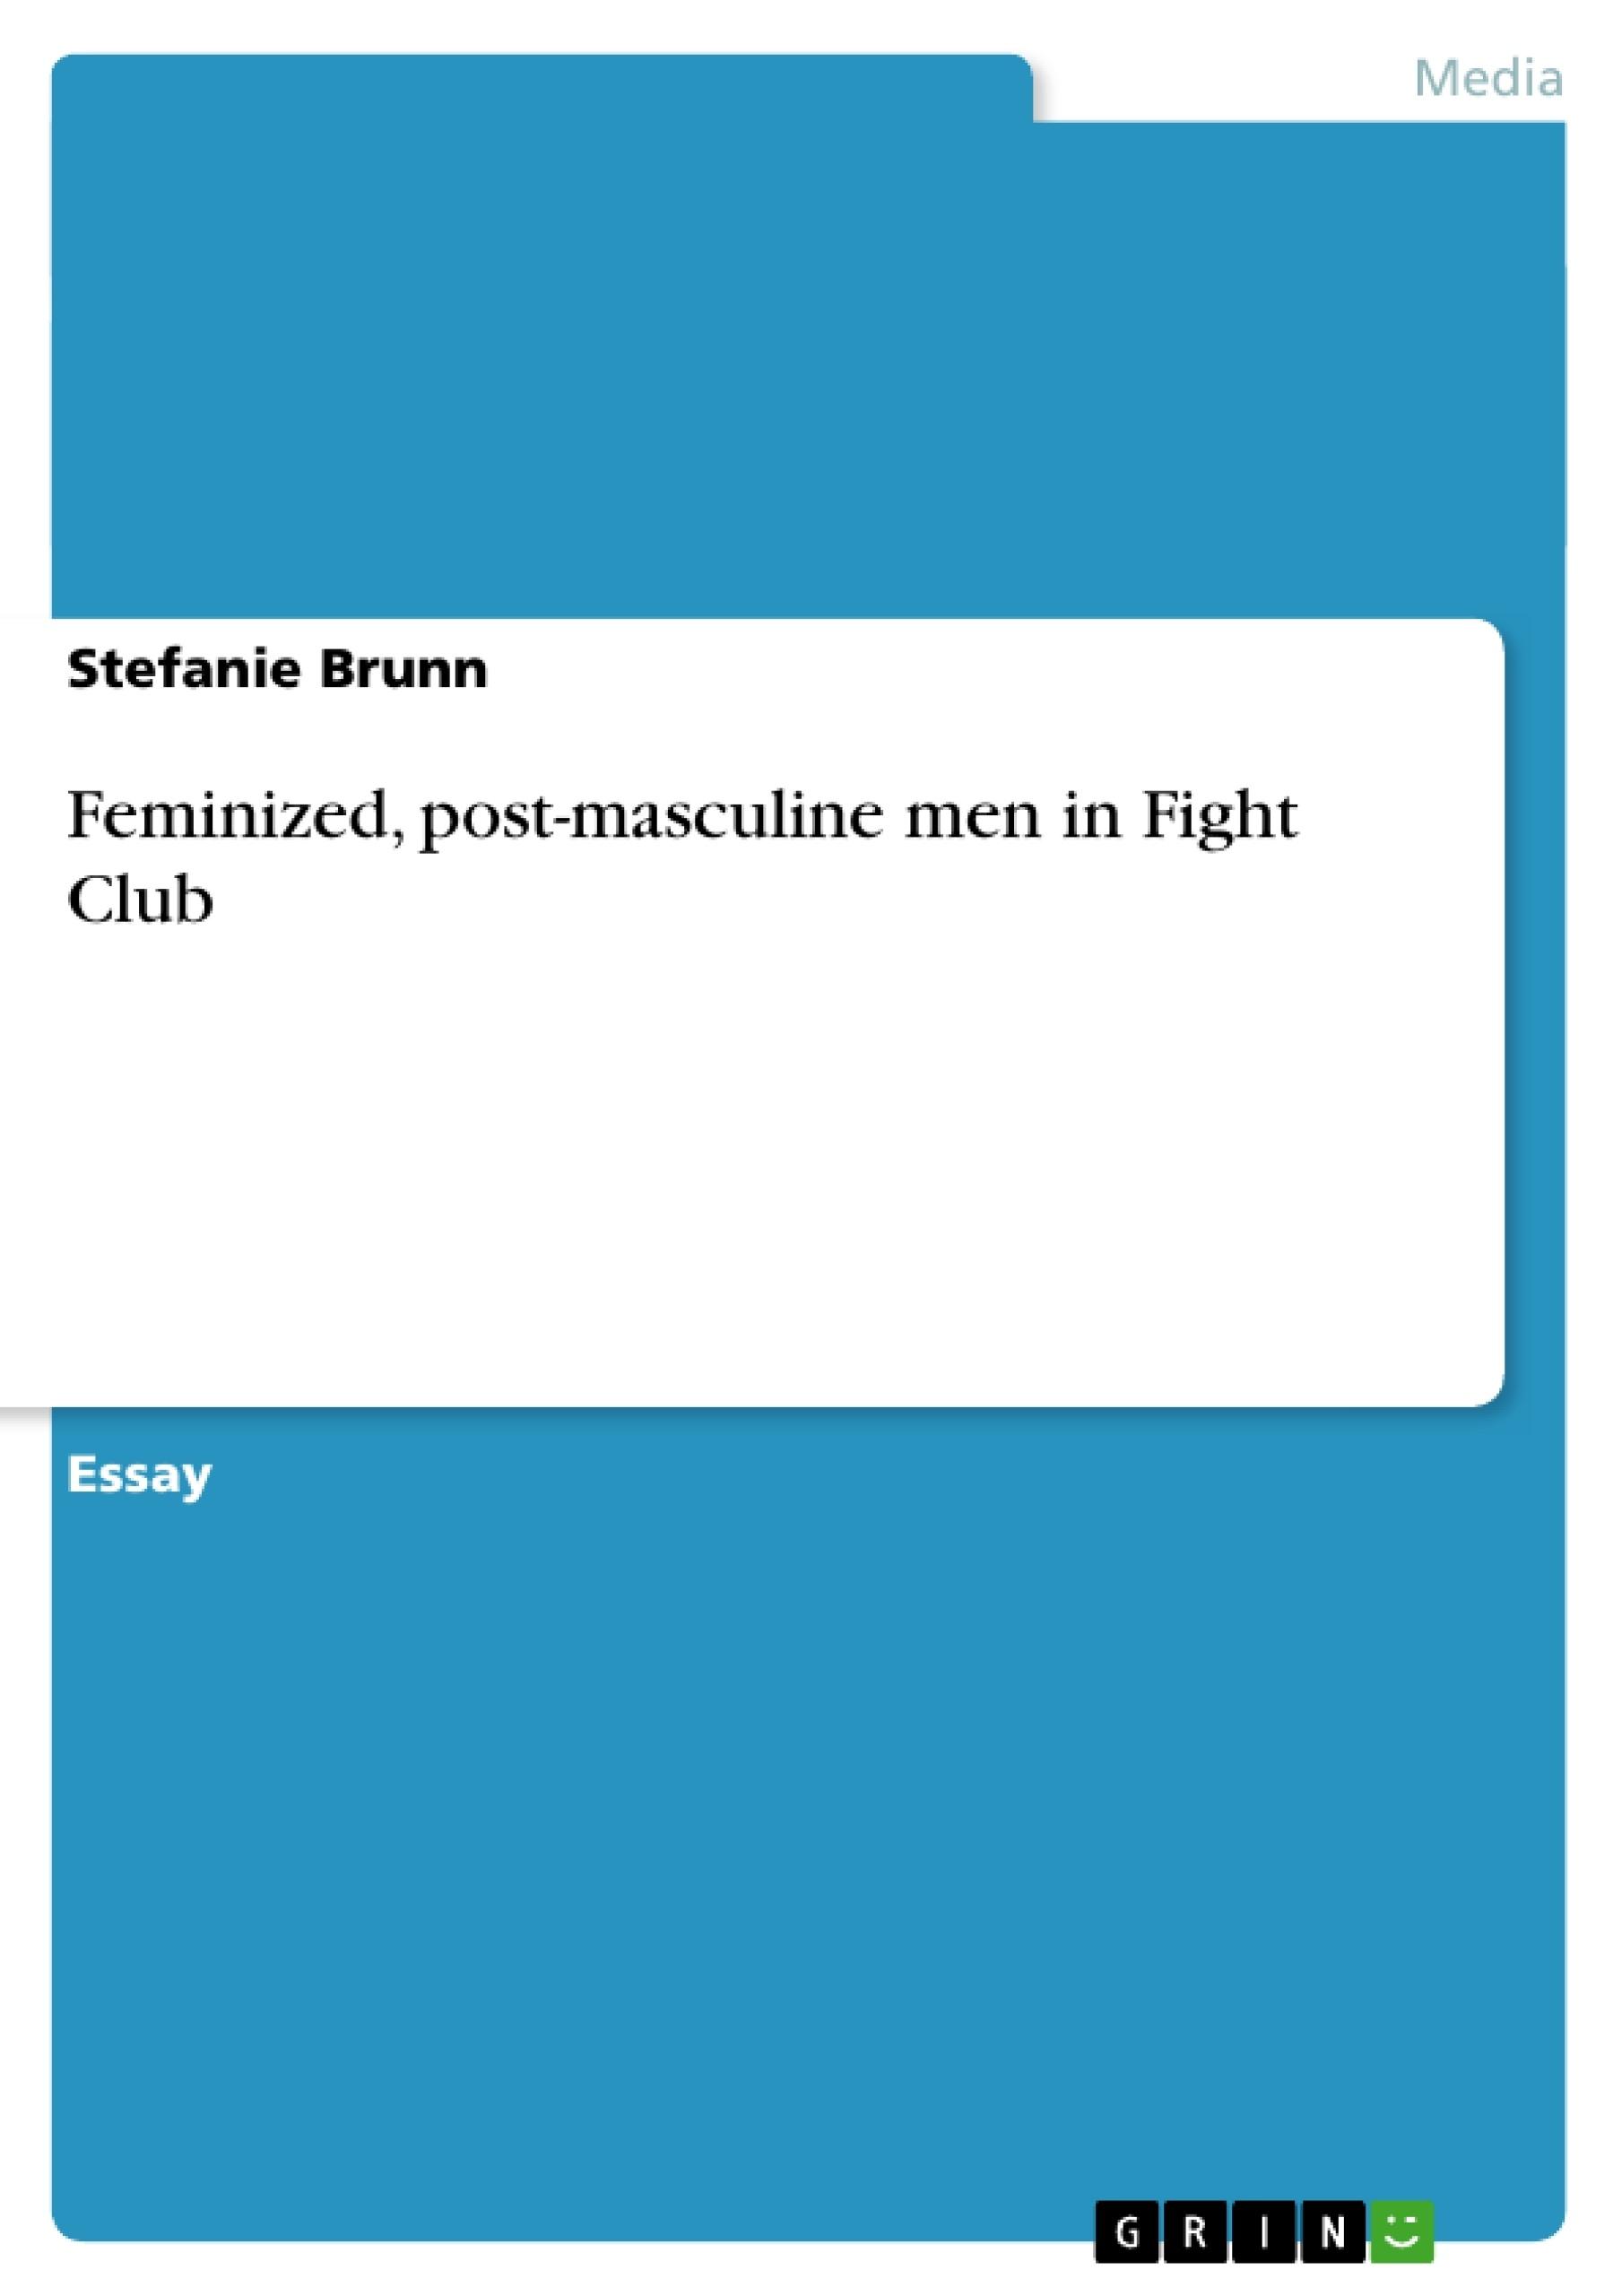 Title: Feminized, post-masculine men in Fight Club